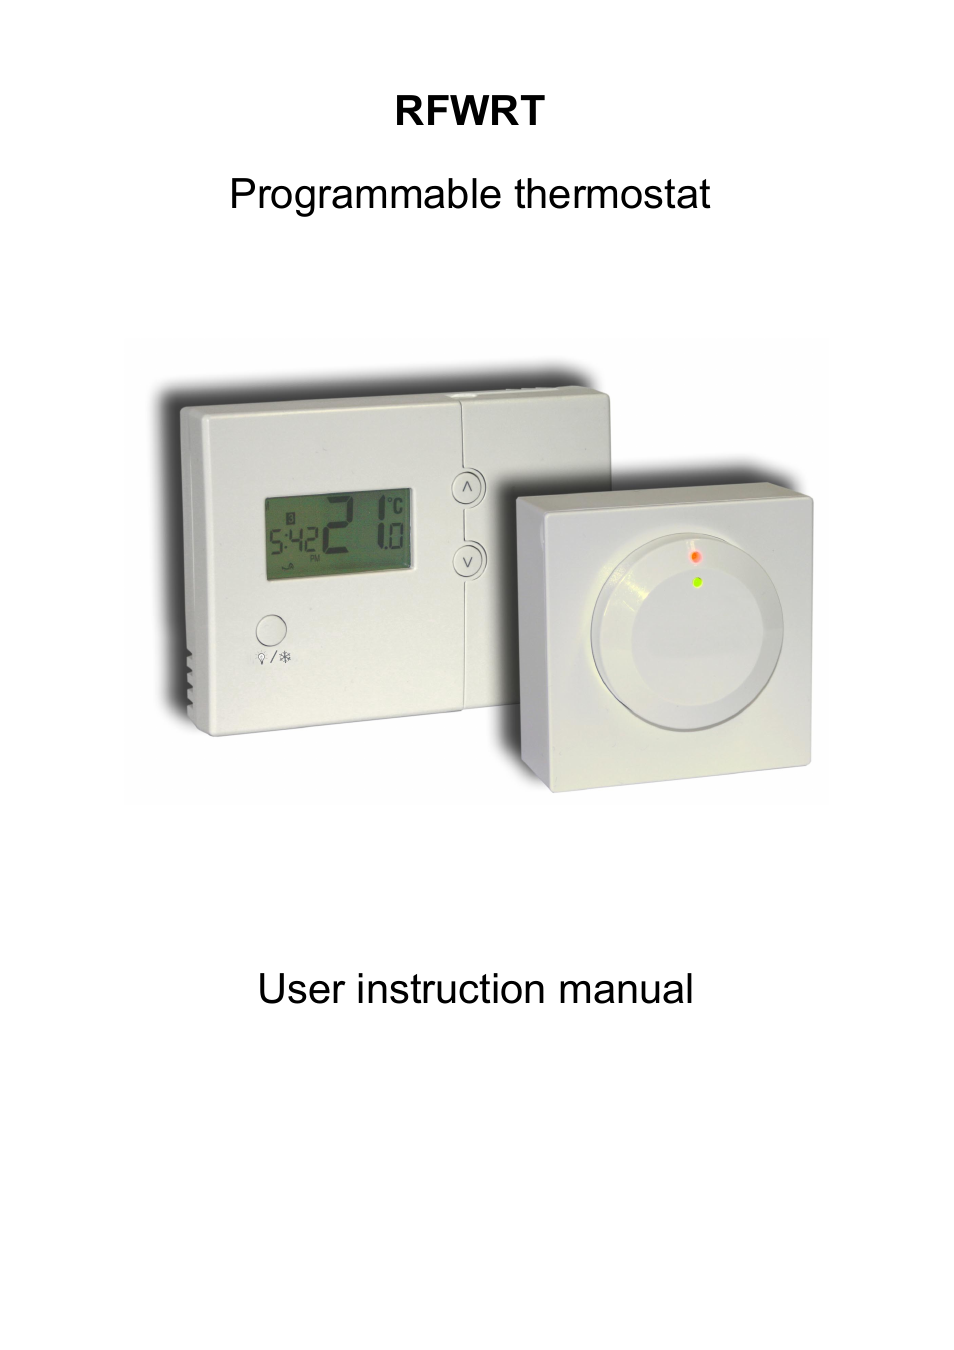 rfwrt programmable thermostat user instruction manual tfc group rh manualsdir com Craftsman LT 2000 Manual PDF Craftsman LT 2000 Manual PDF